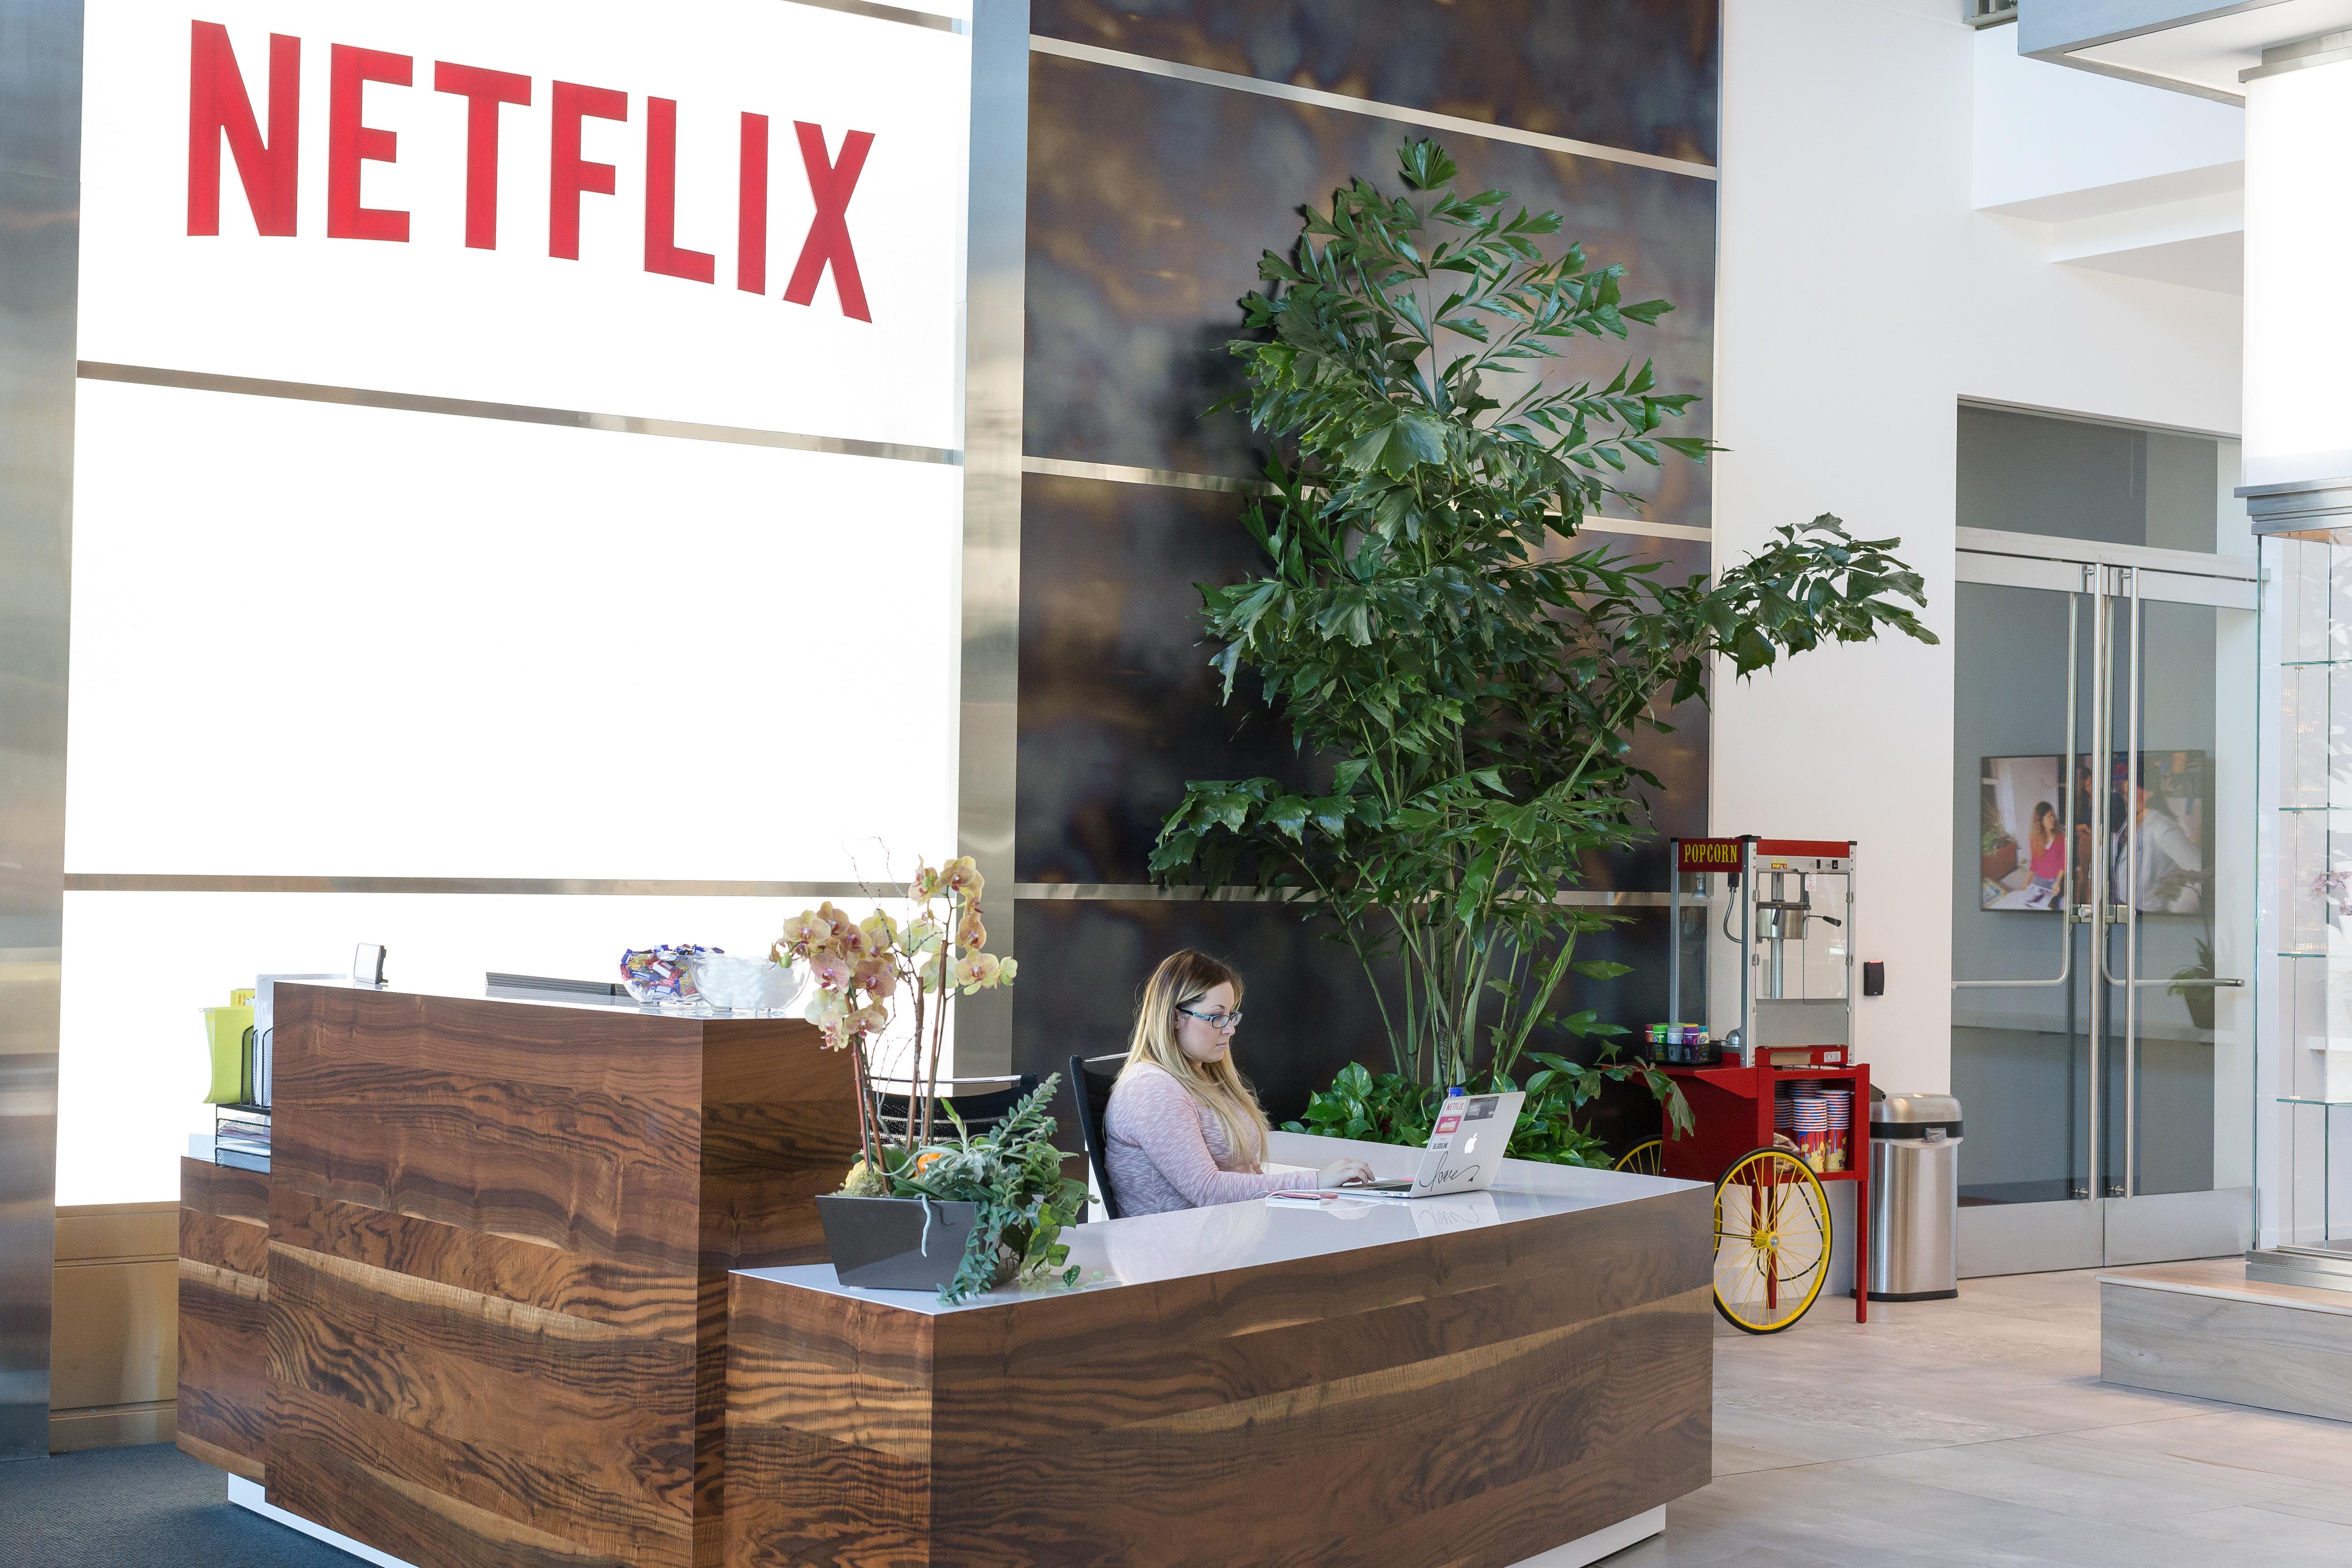 A receptionist at Netflix HQ.